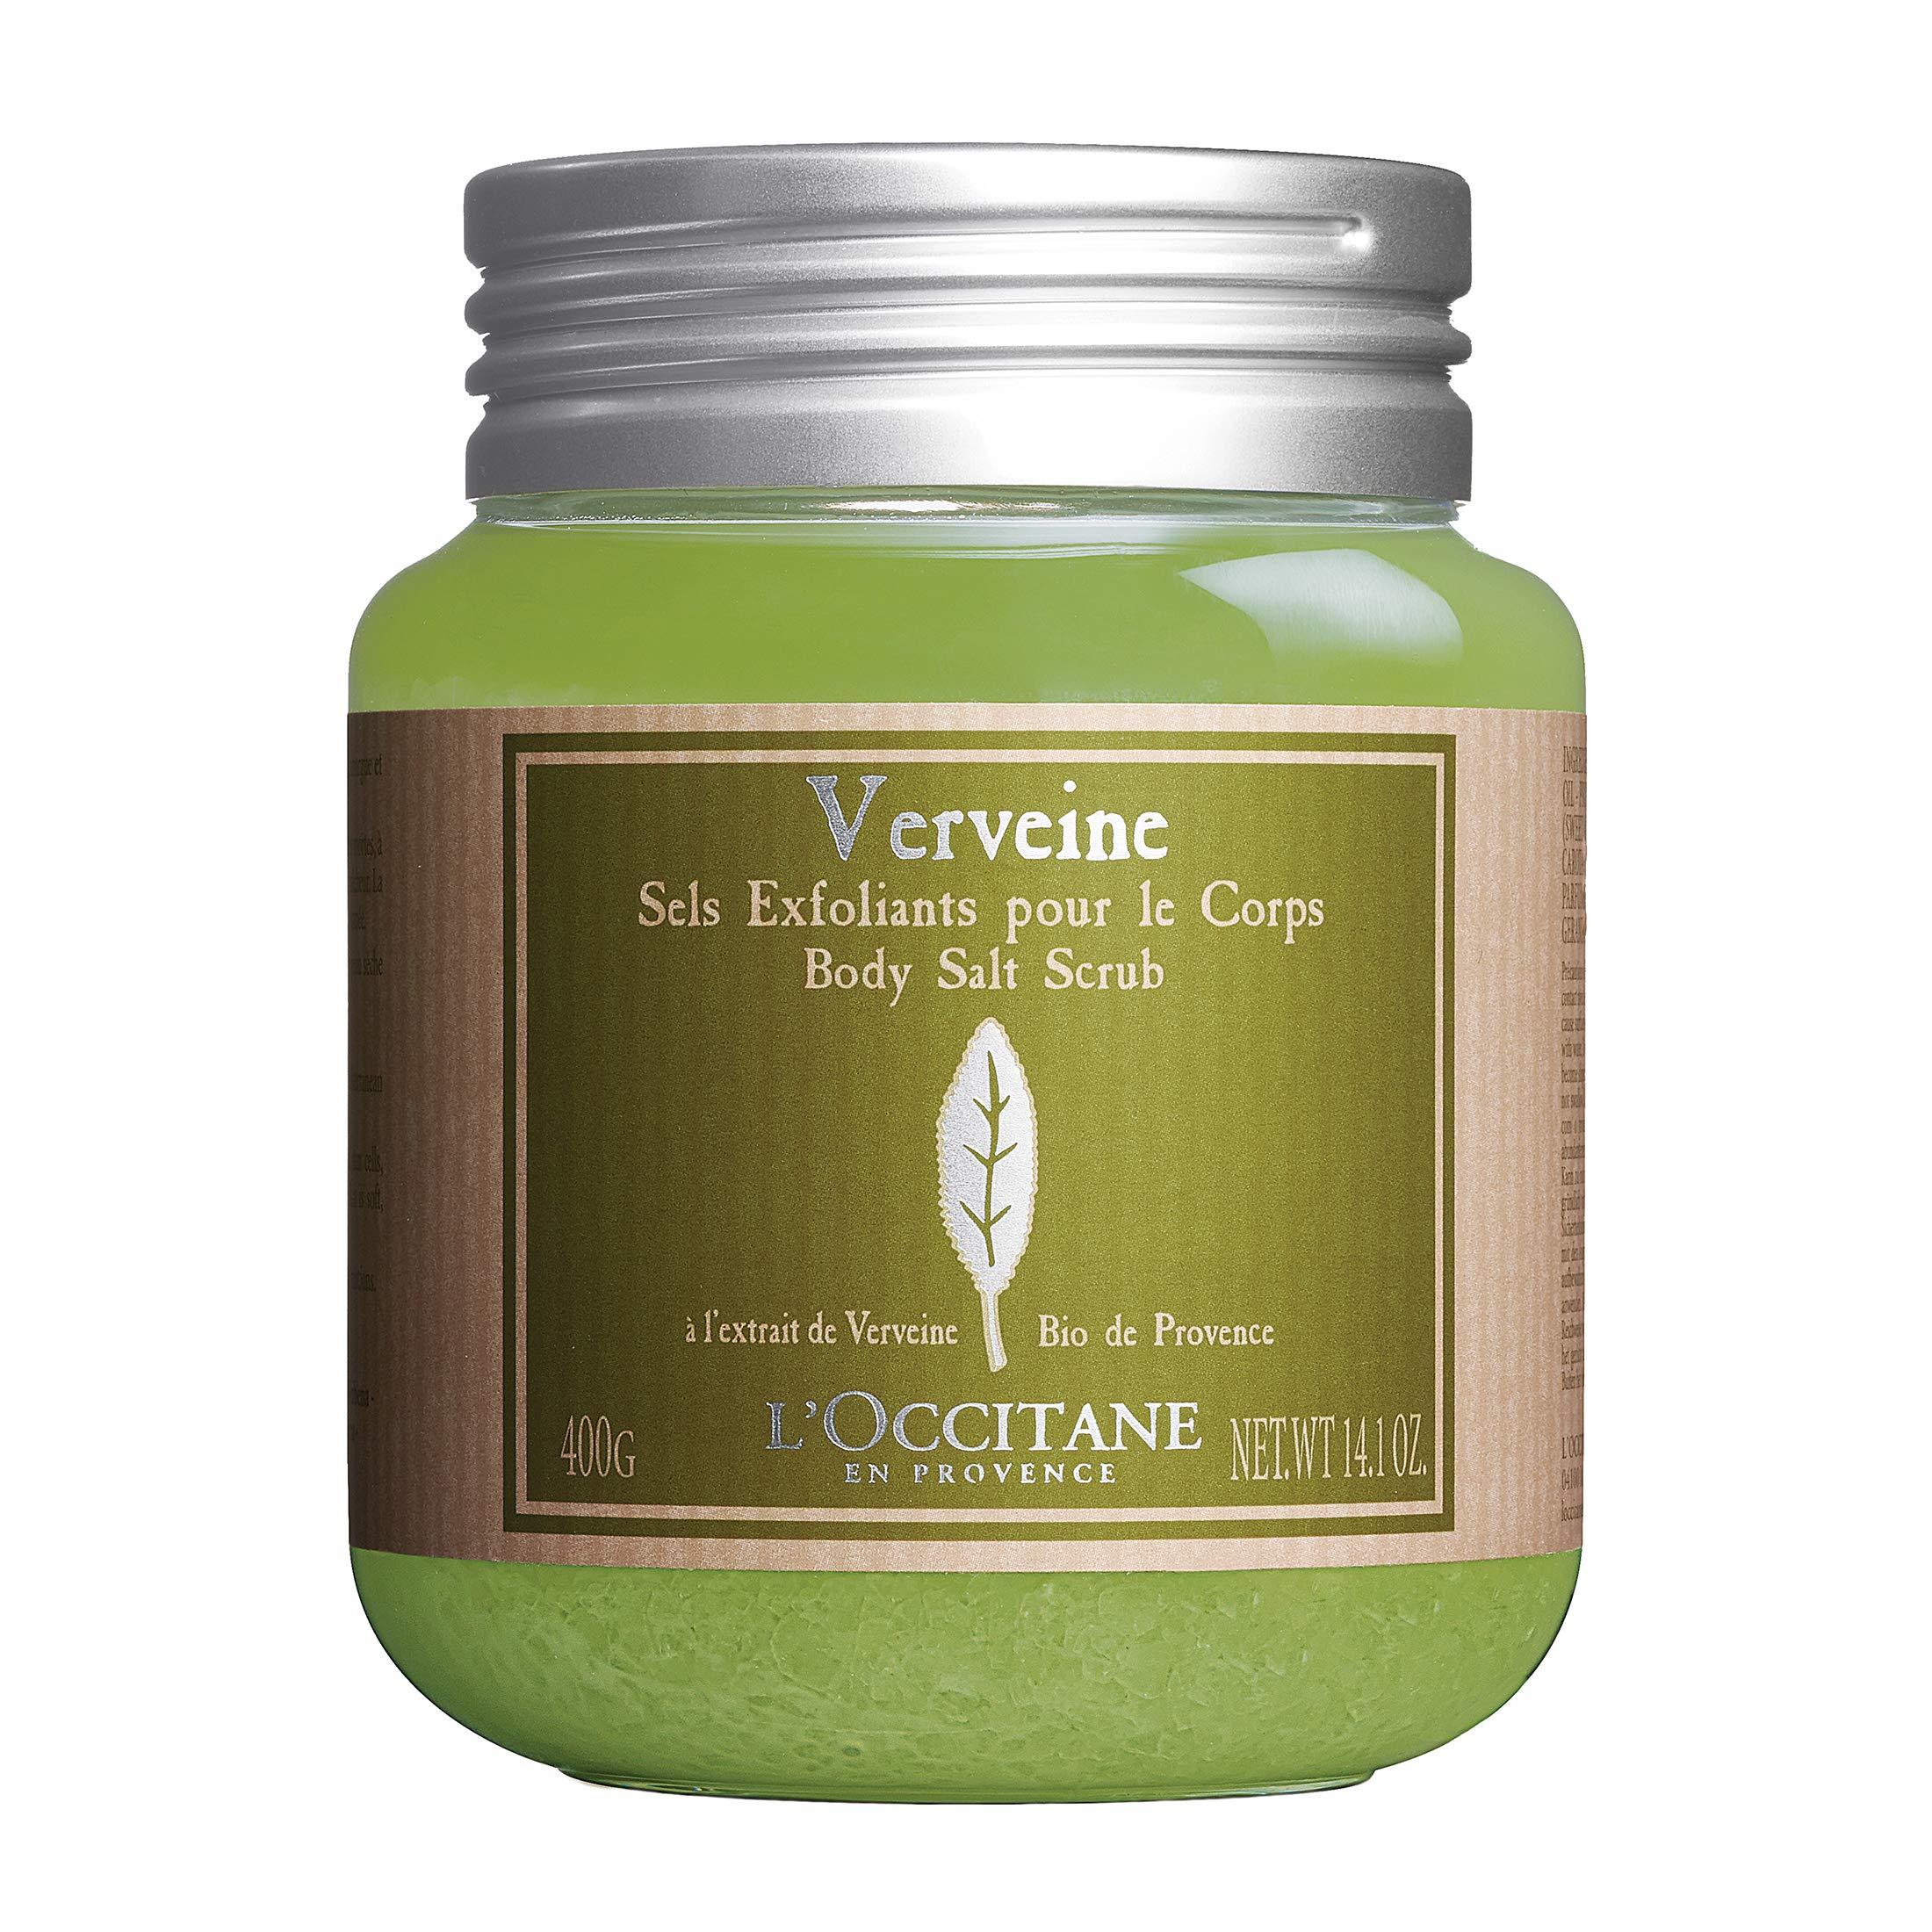 L'Occitane Verbena Body Salt Scrub with Organic Verbena, Sweet Almond Oil & Apricot Oil, 14.1 oz.